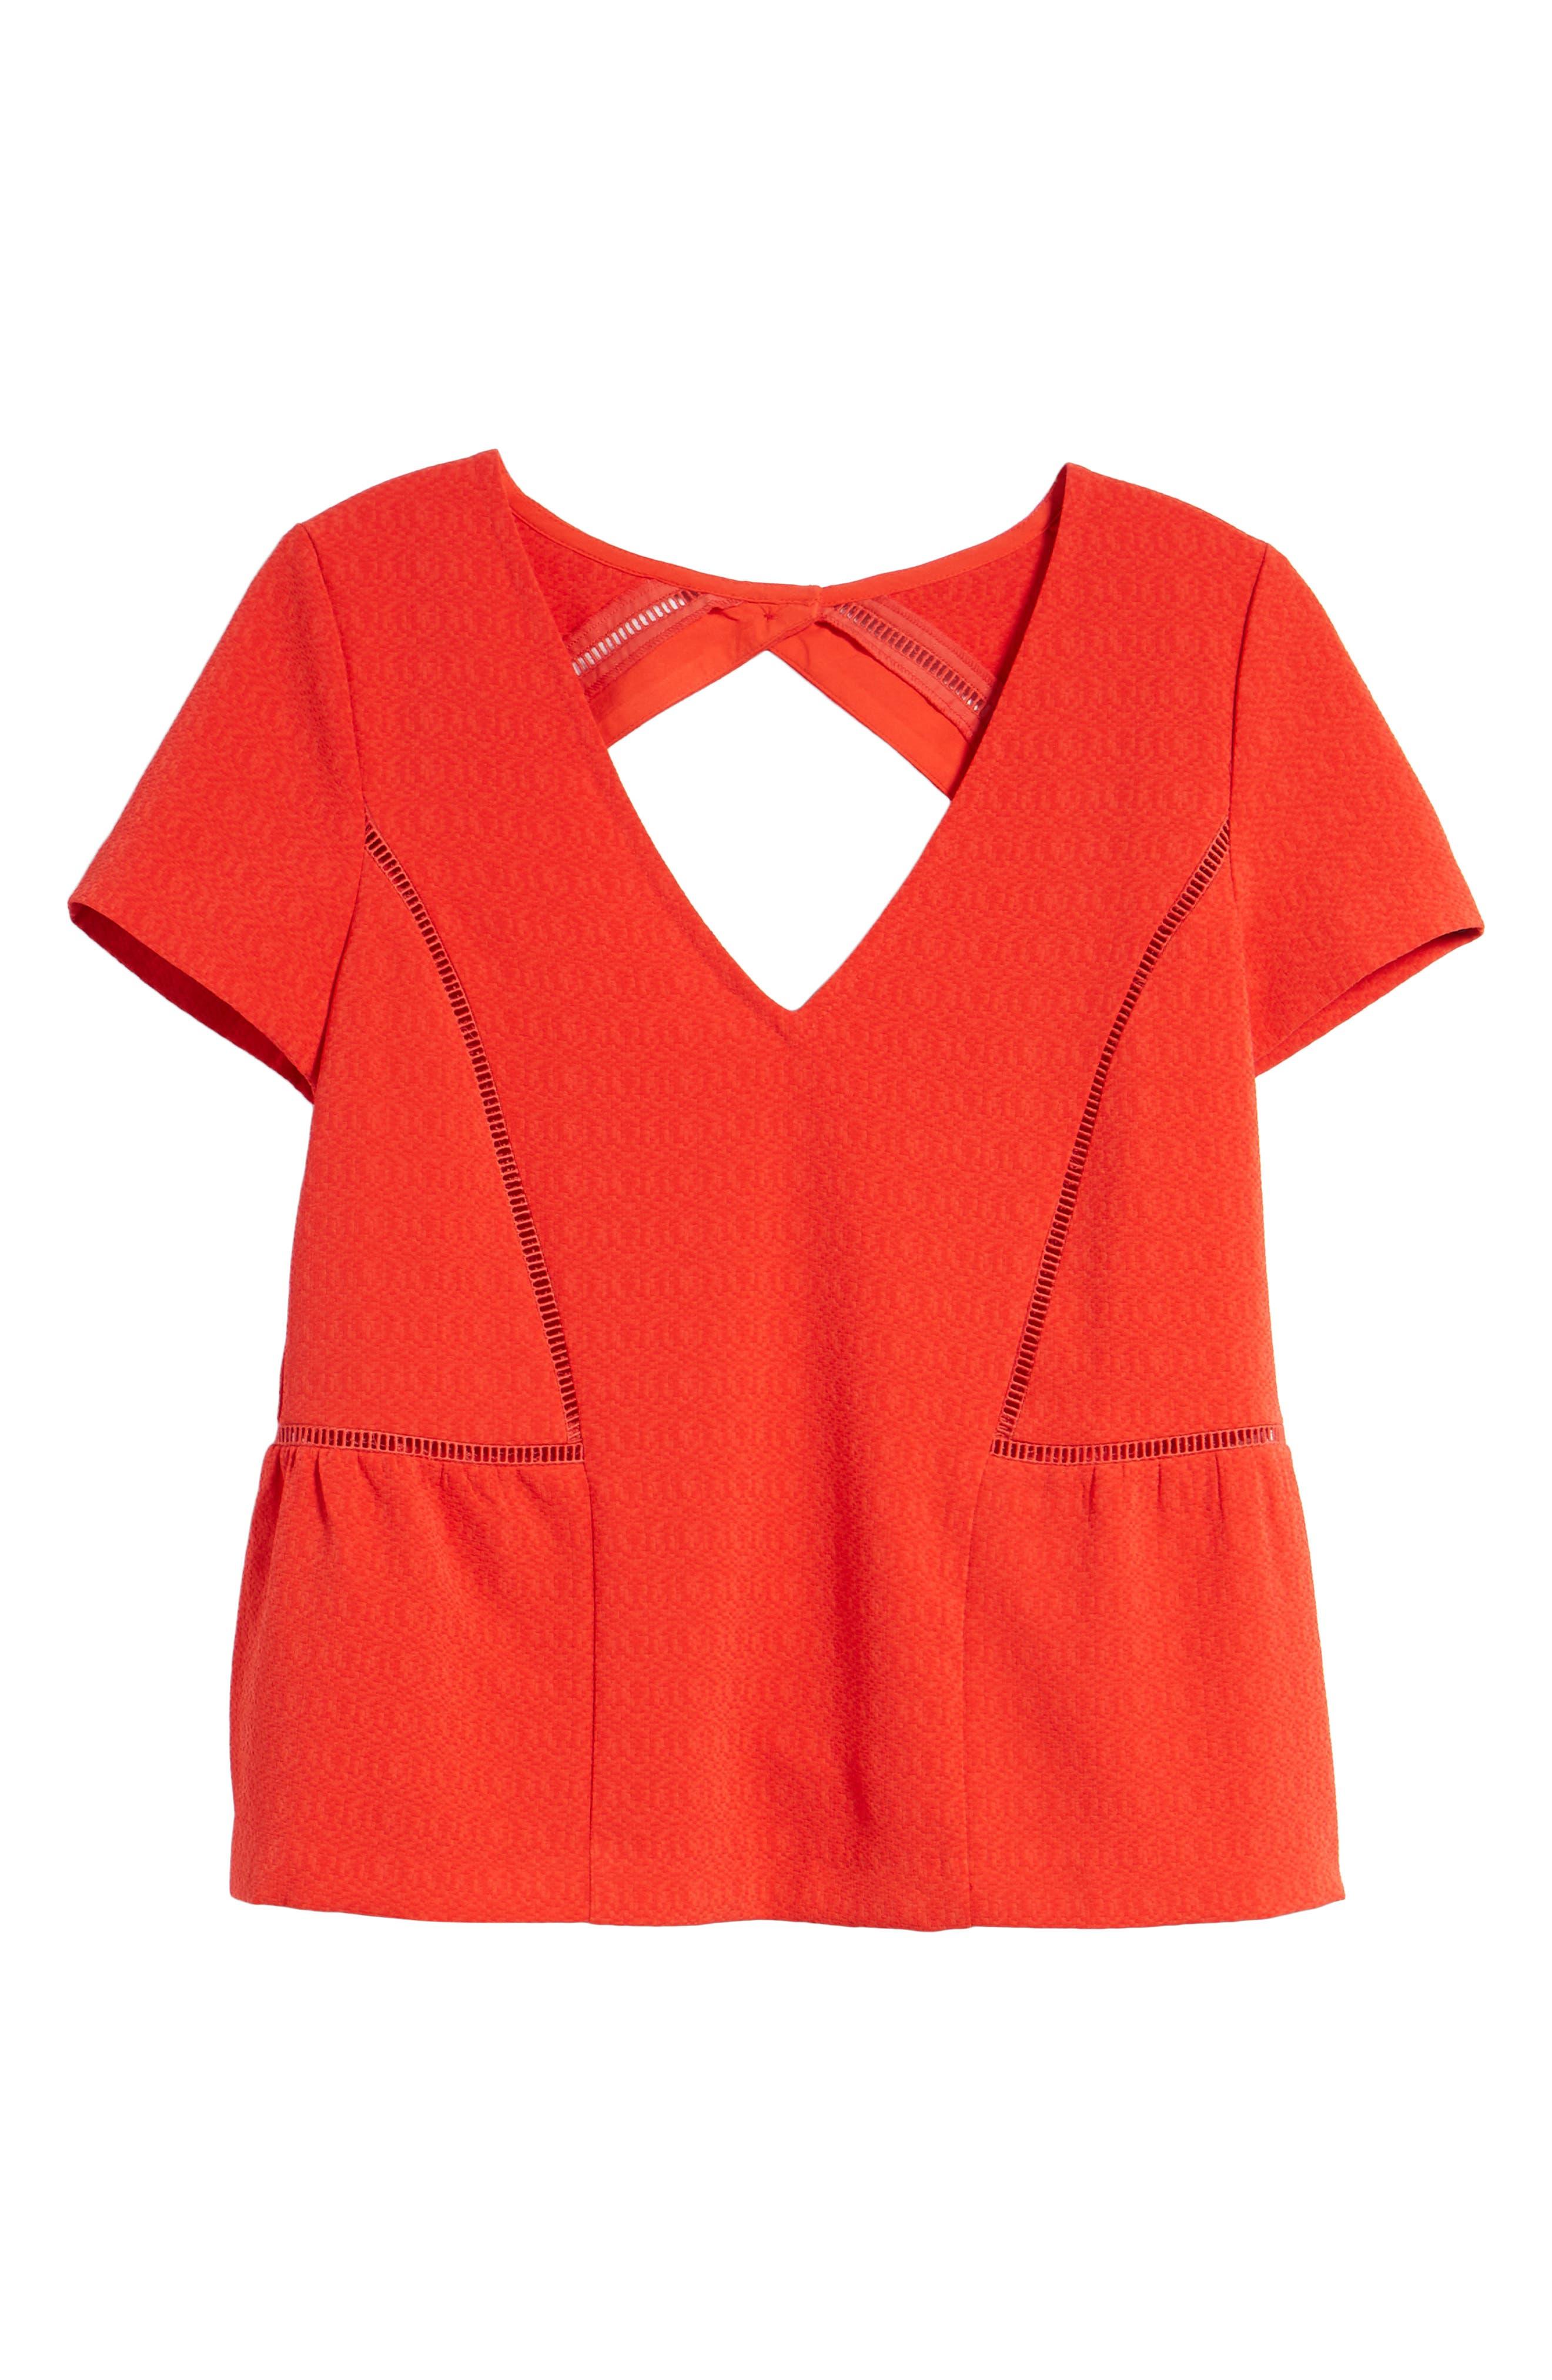 Amanda Ladder Stitch Blouse,                             Alternate thumbnail 6, color,                             Coral Red